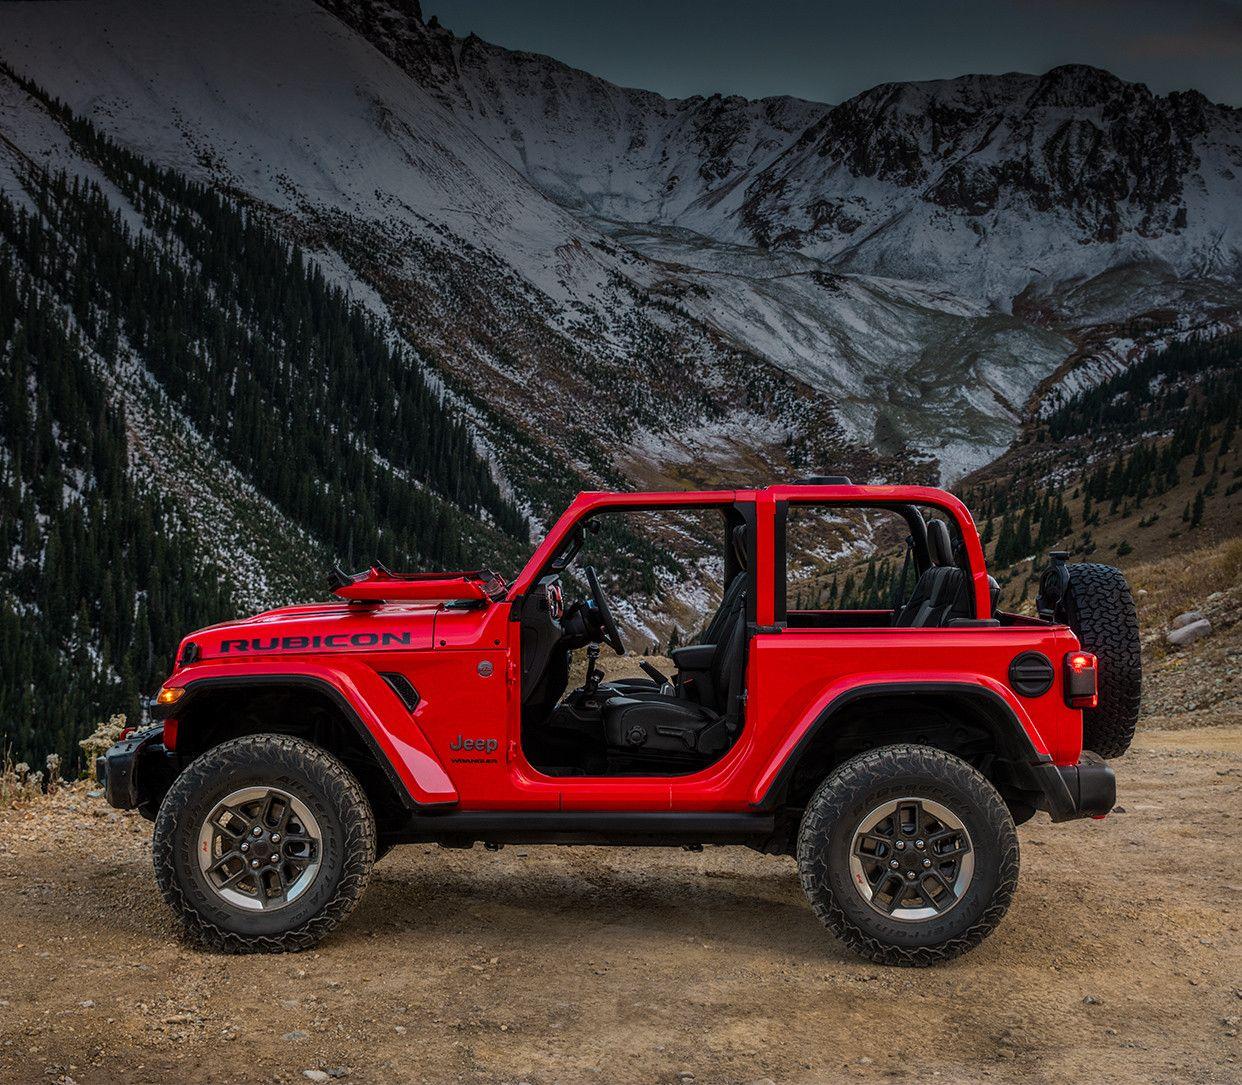 2020 Jeep Wrangler Off Road 4x4 Suv Wrangler Jl Jeep Wrangler Jeep